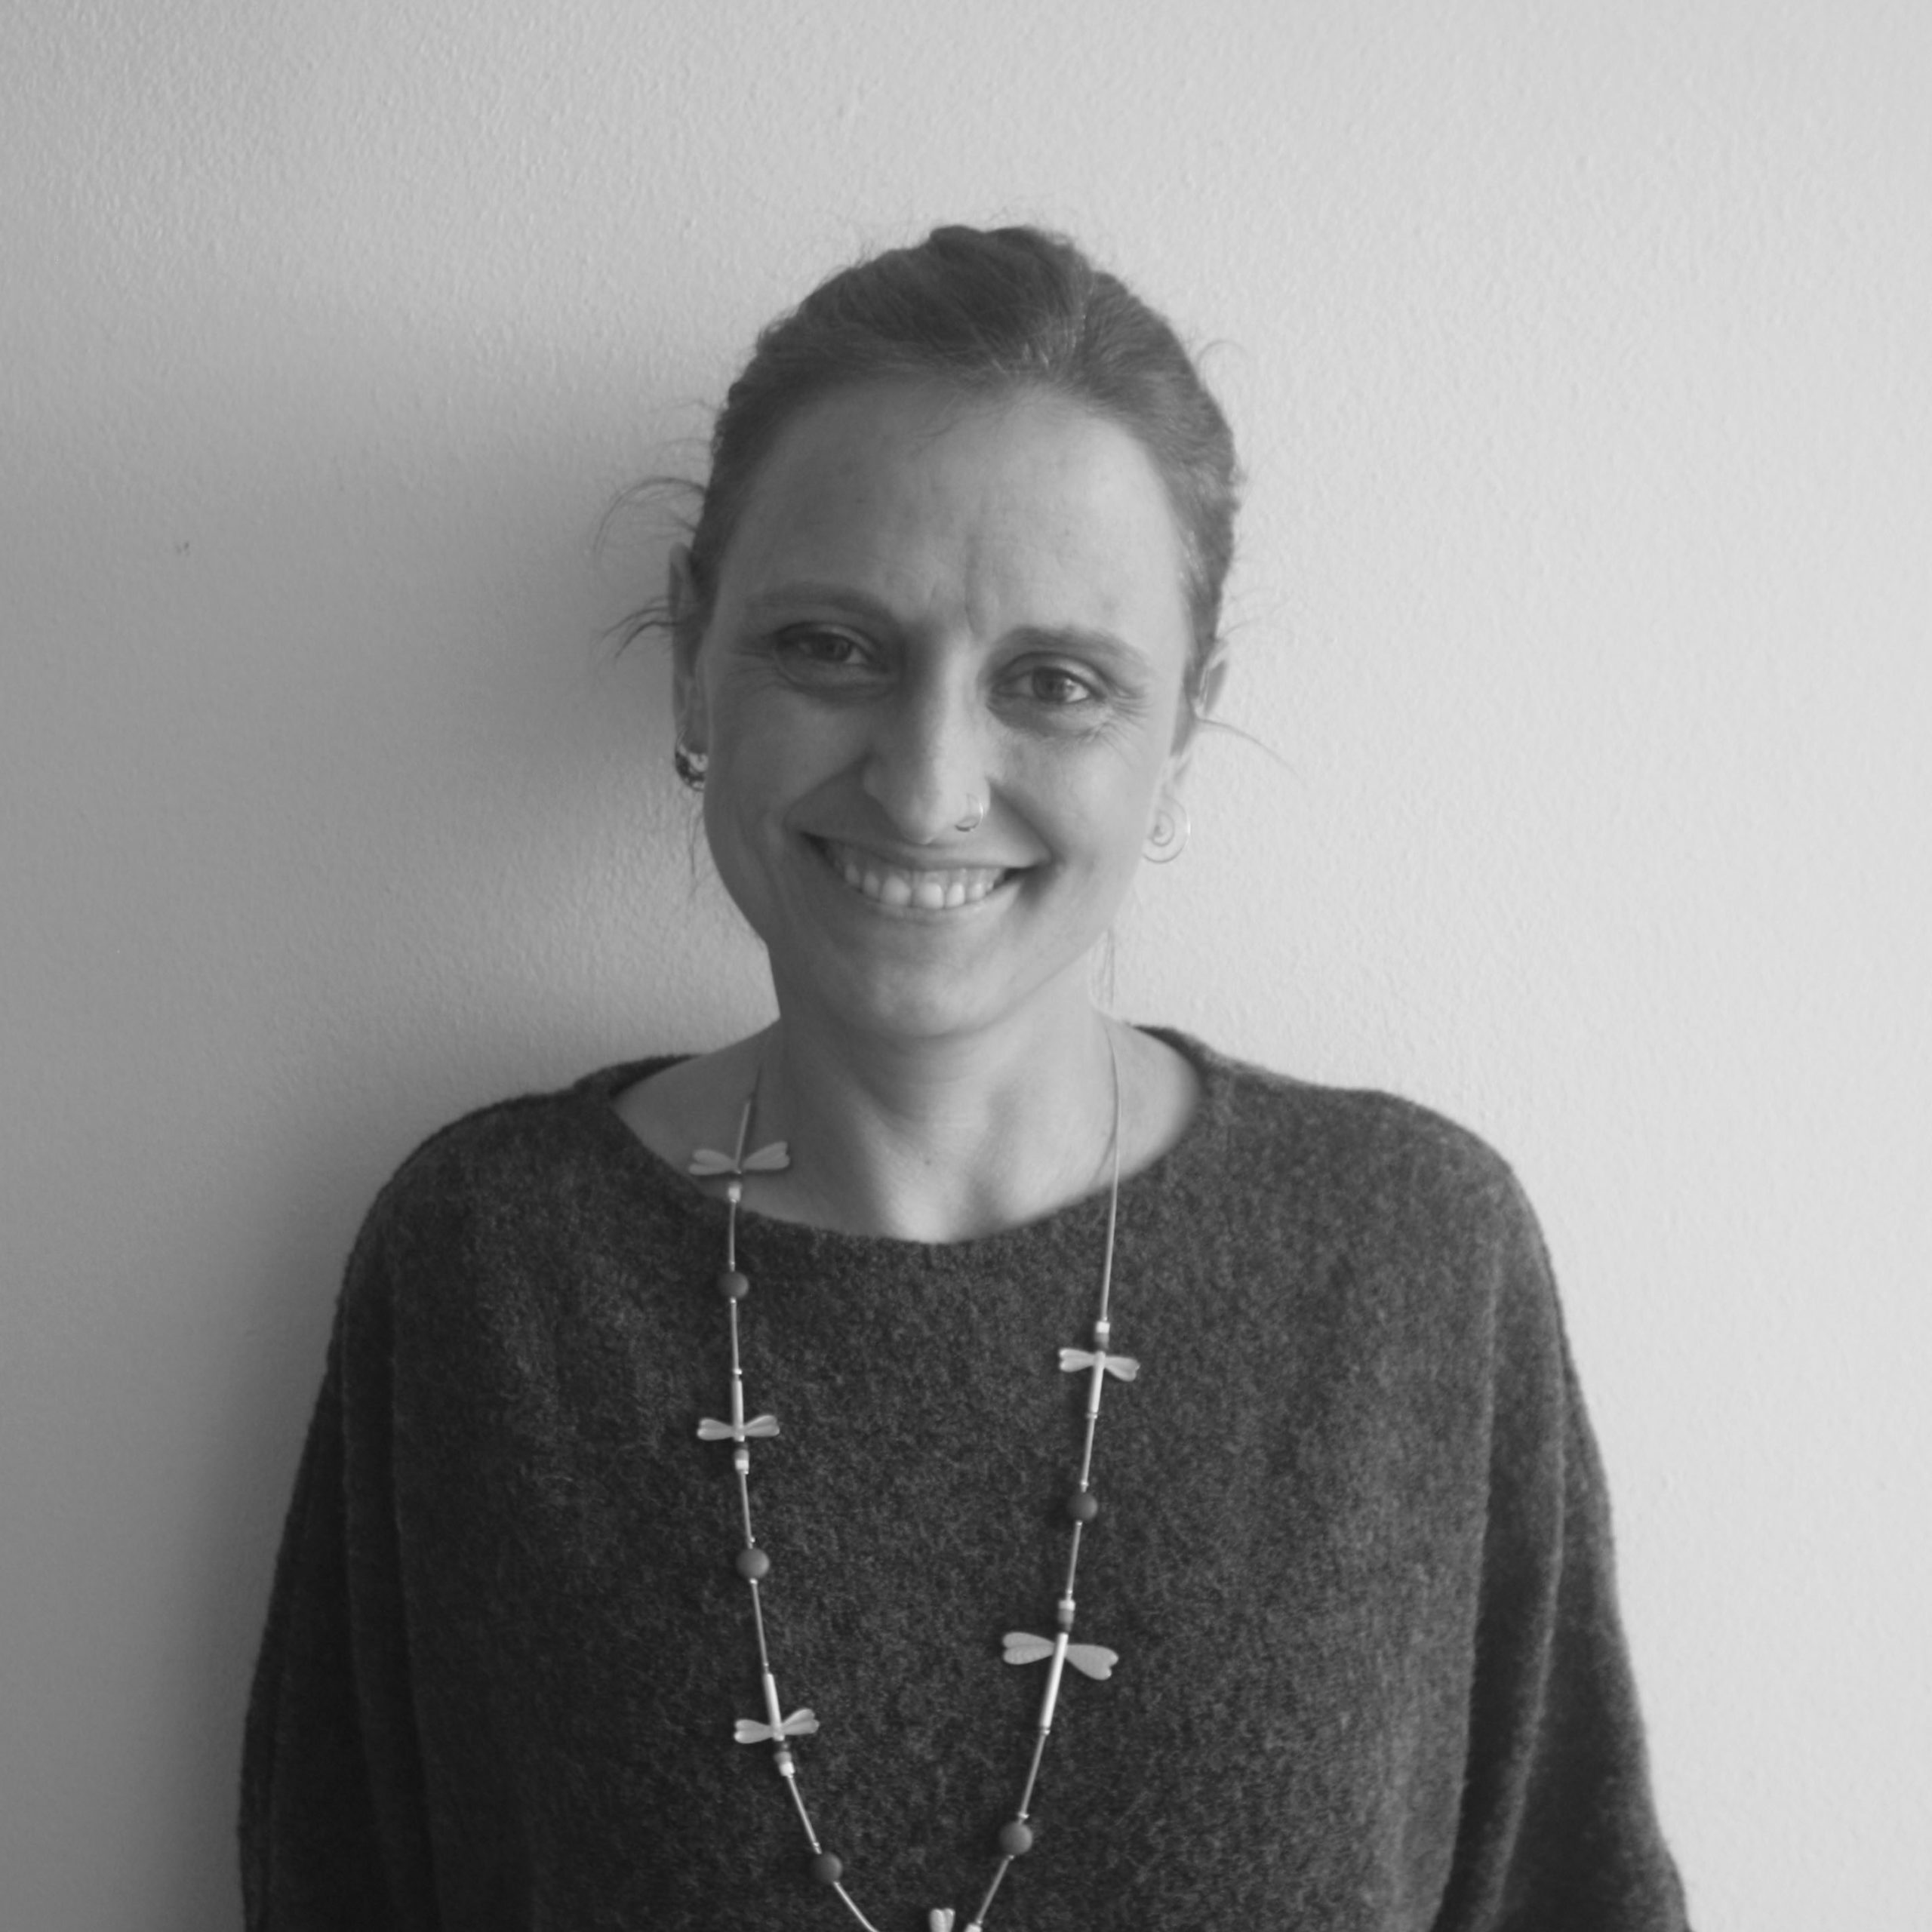 Lisa Guandalini